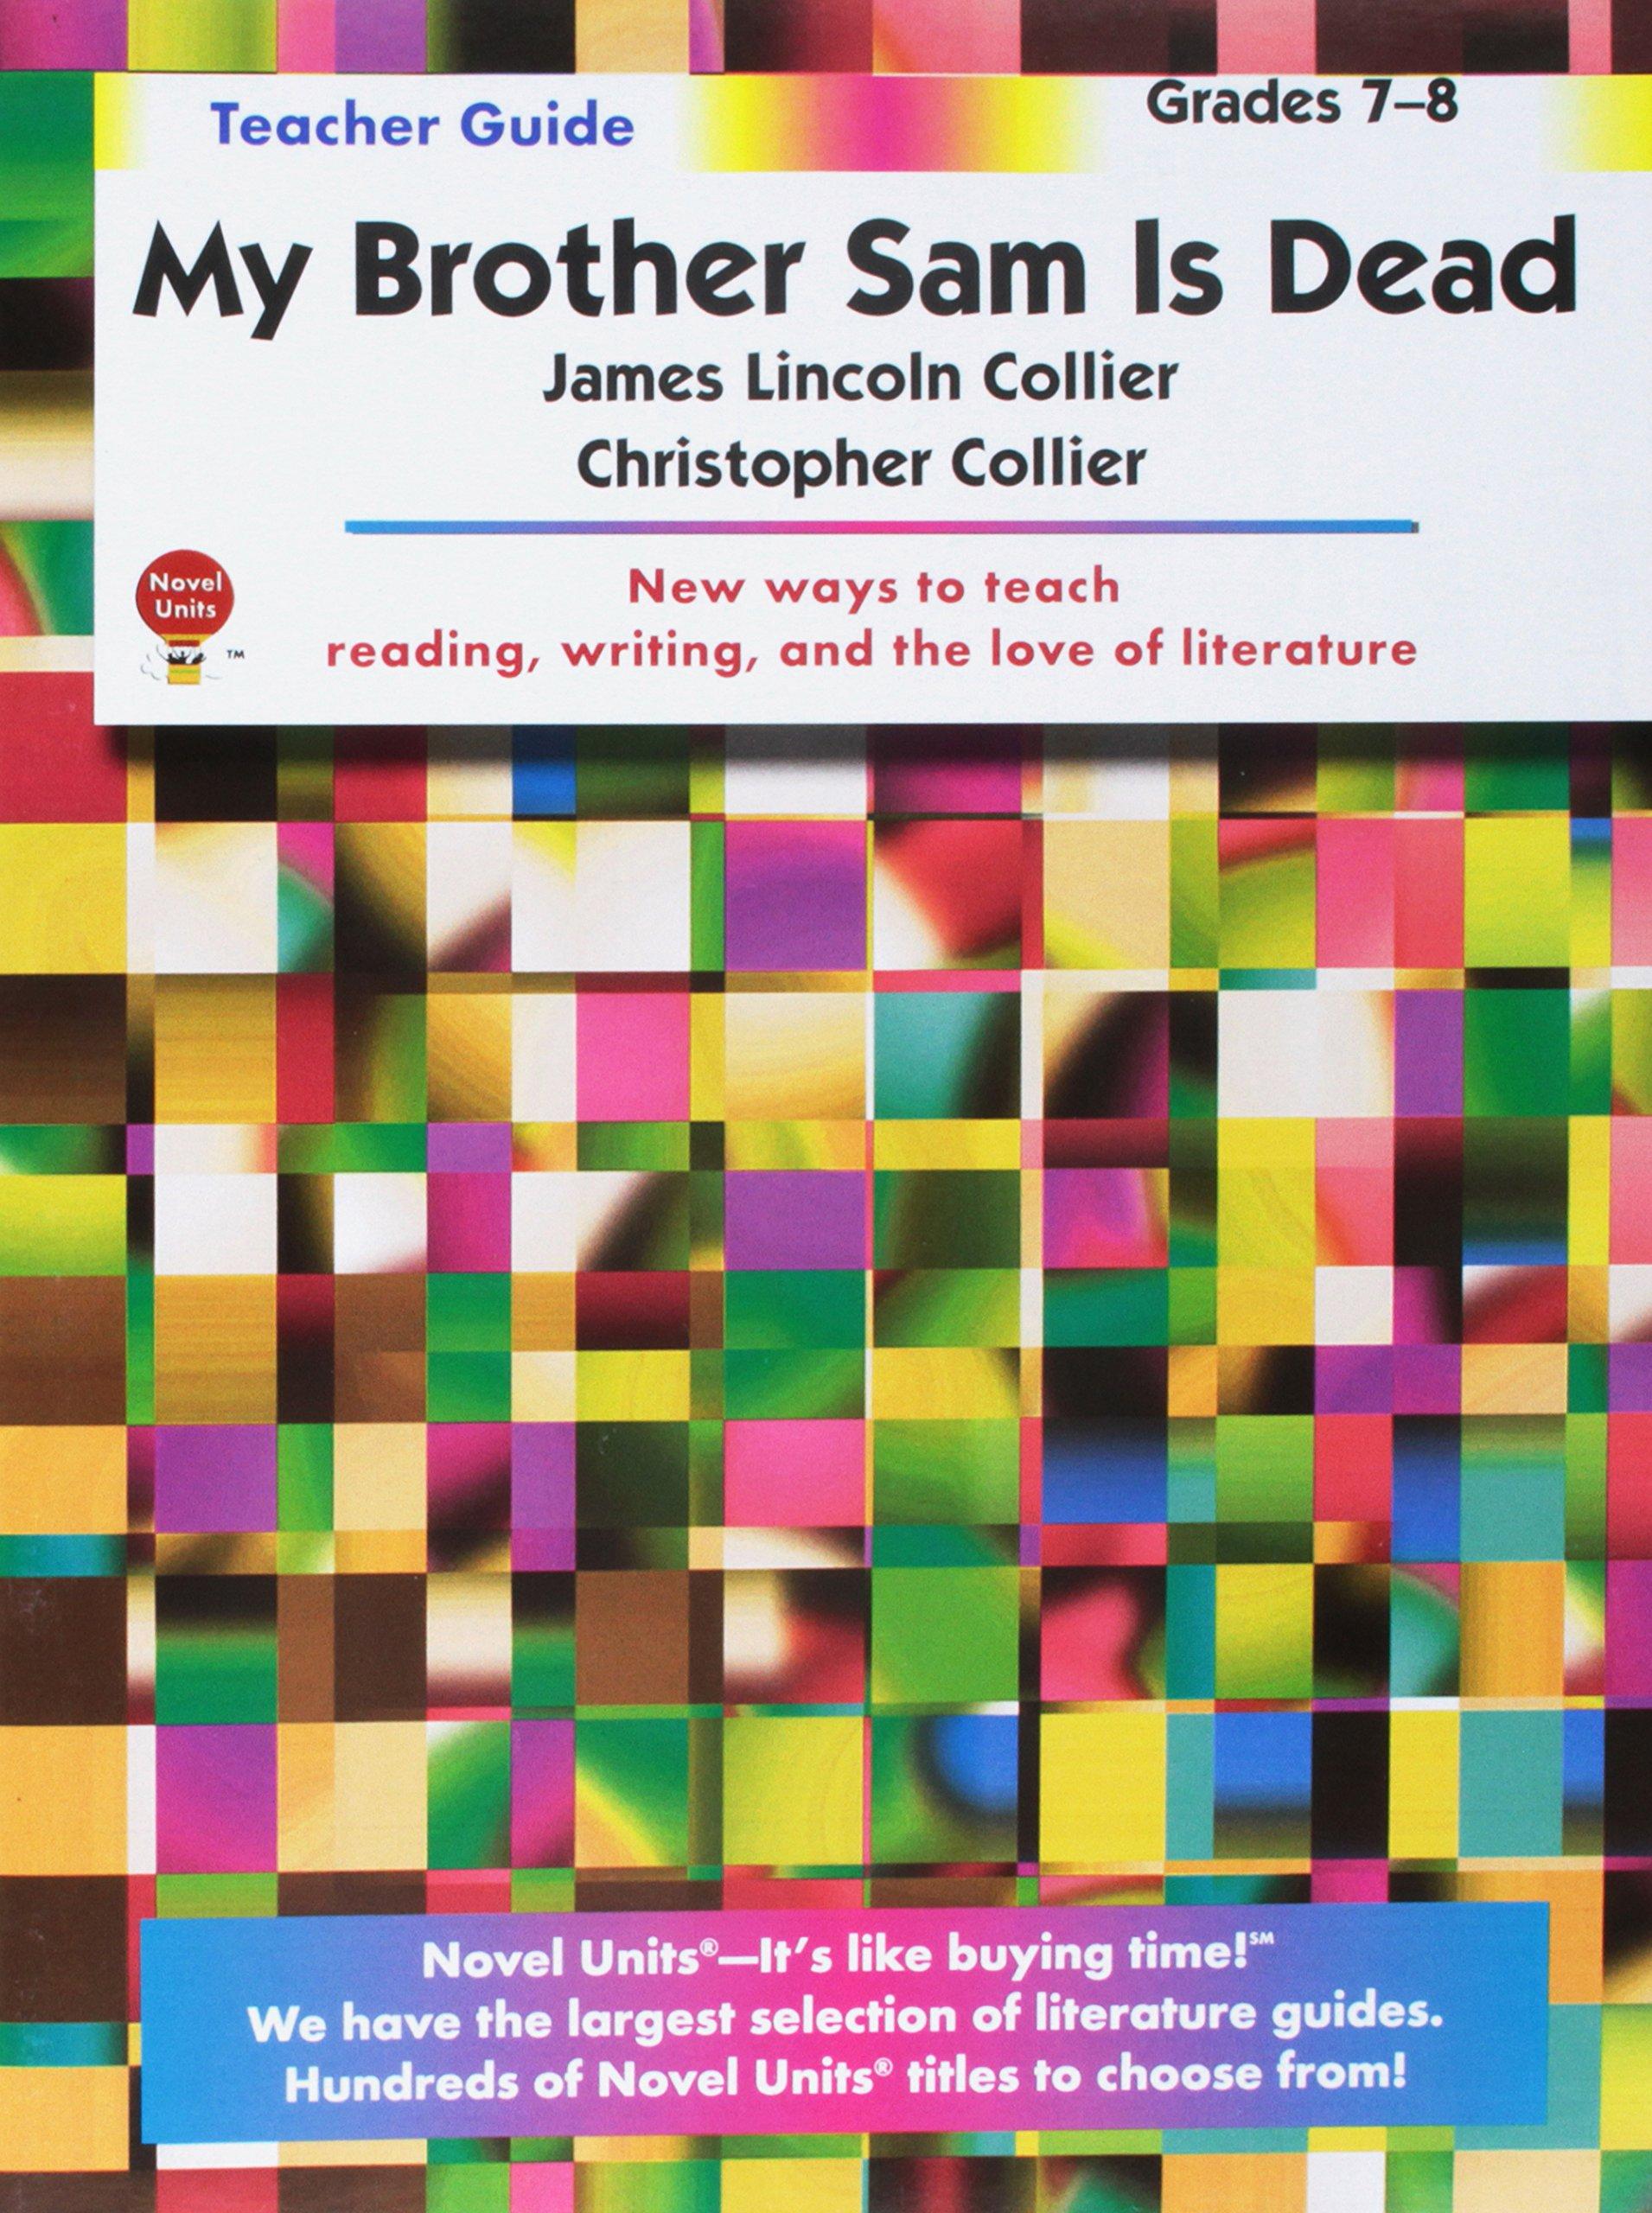 My Brother Sam is Dead (Teacher Guide): Novel Units: 9781561373802: Amazon.com:  Books